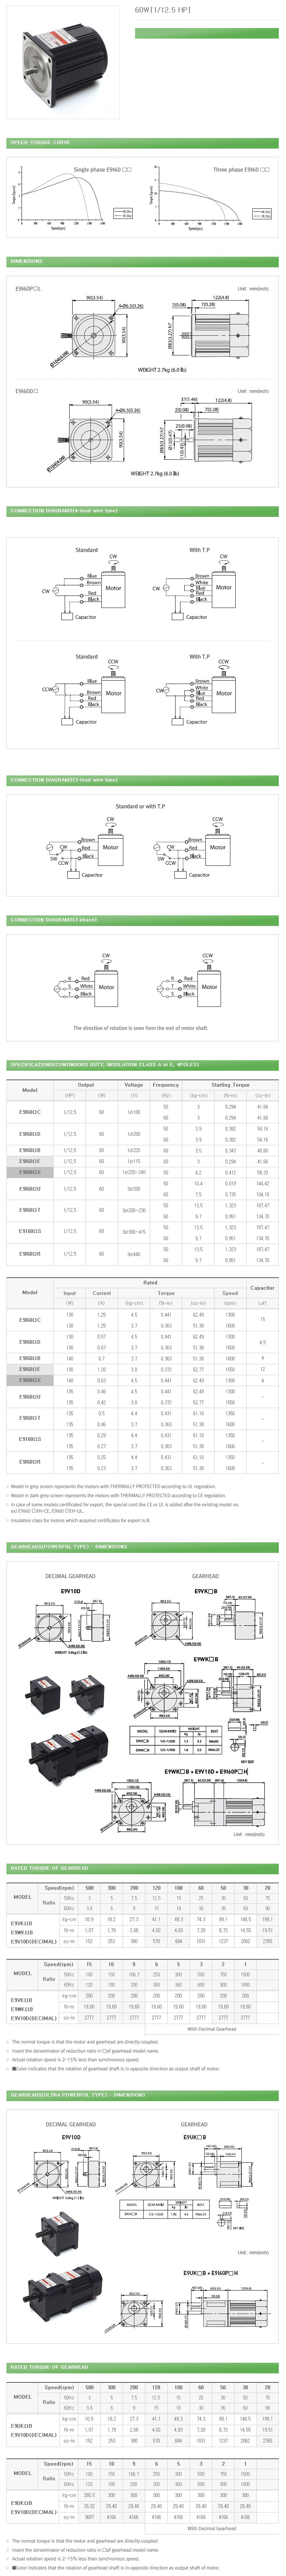 DAEHWA E/M Induction Motor (60W, 1/12.5 HP)